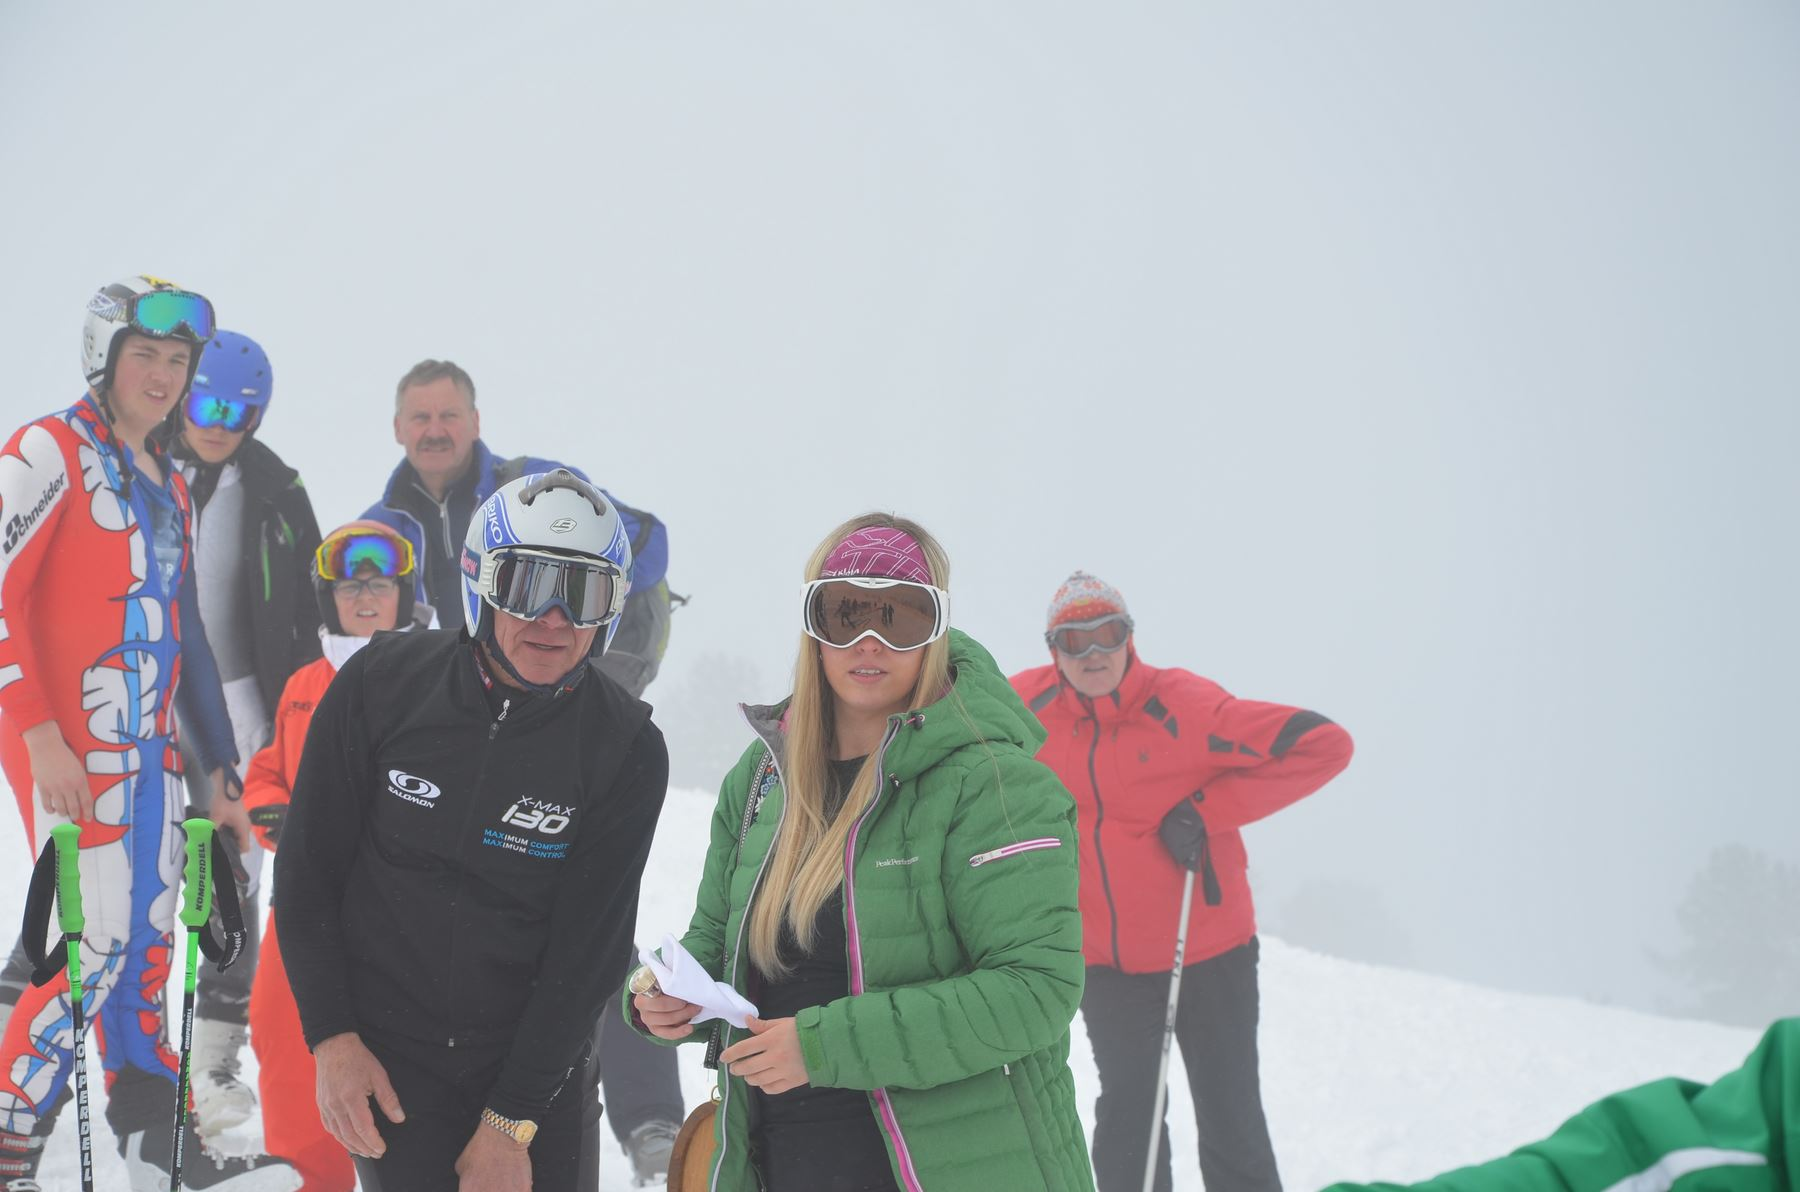 2015-03-22 BV Zillertal Skirennen 198.JPG